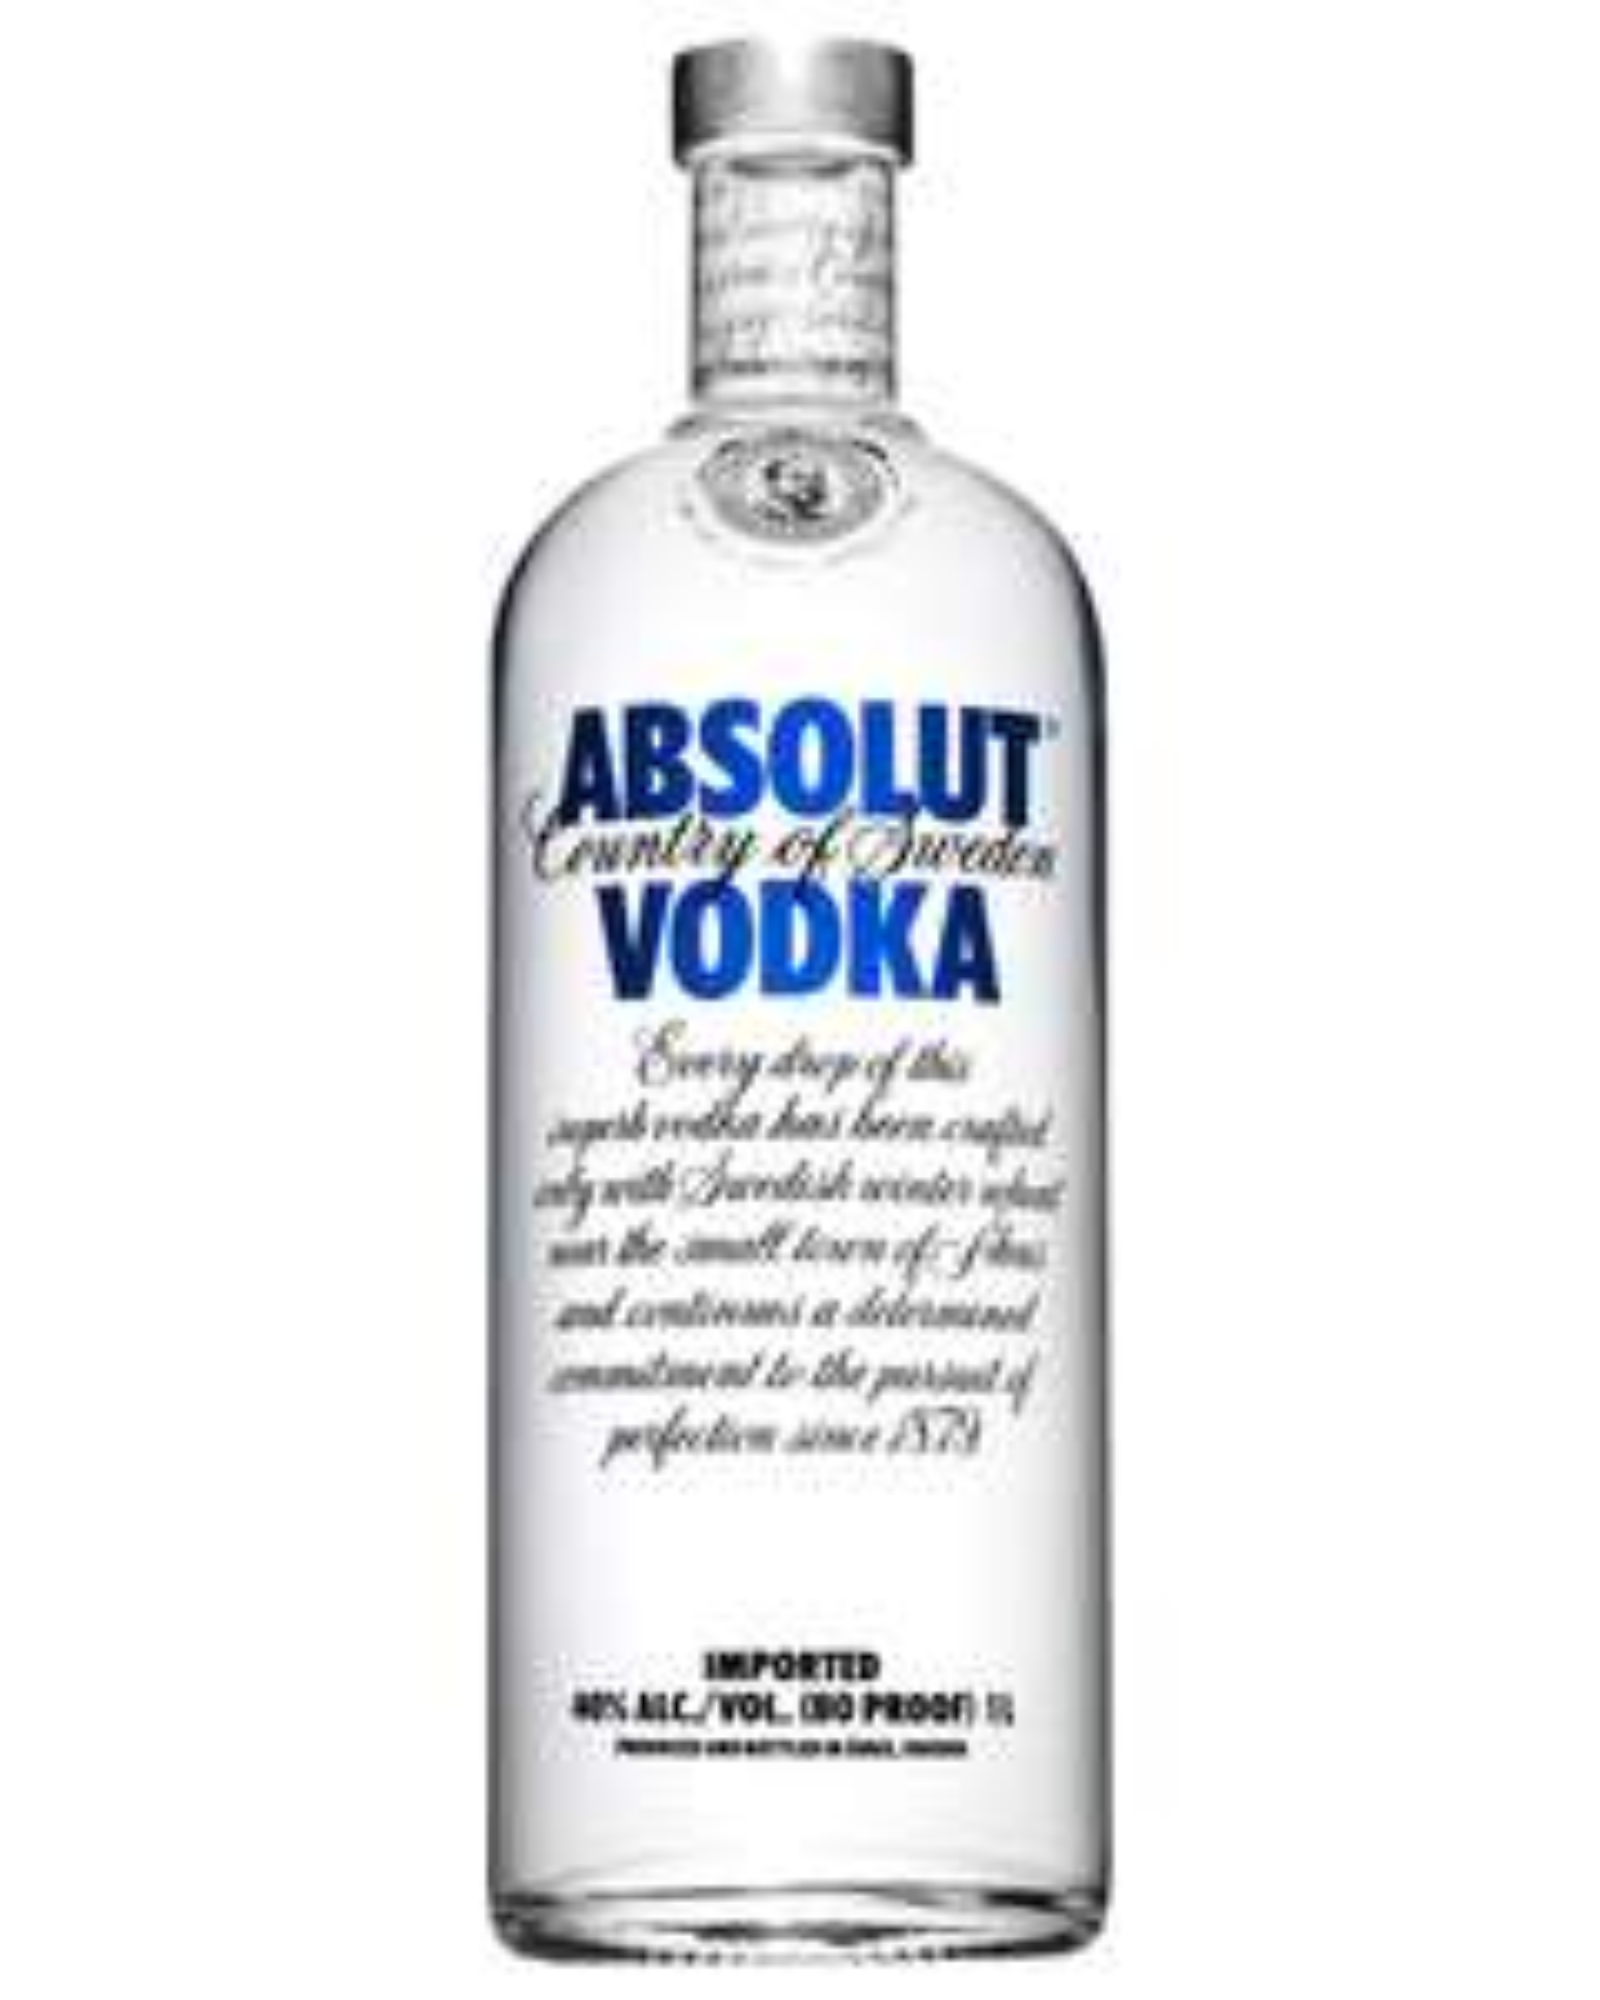 Sainsbury's - Absolut Vodka 1l - £20 was £25